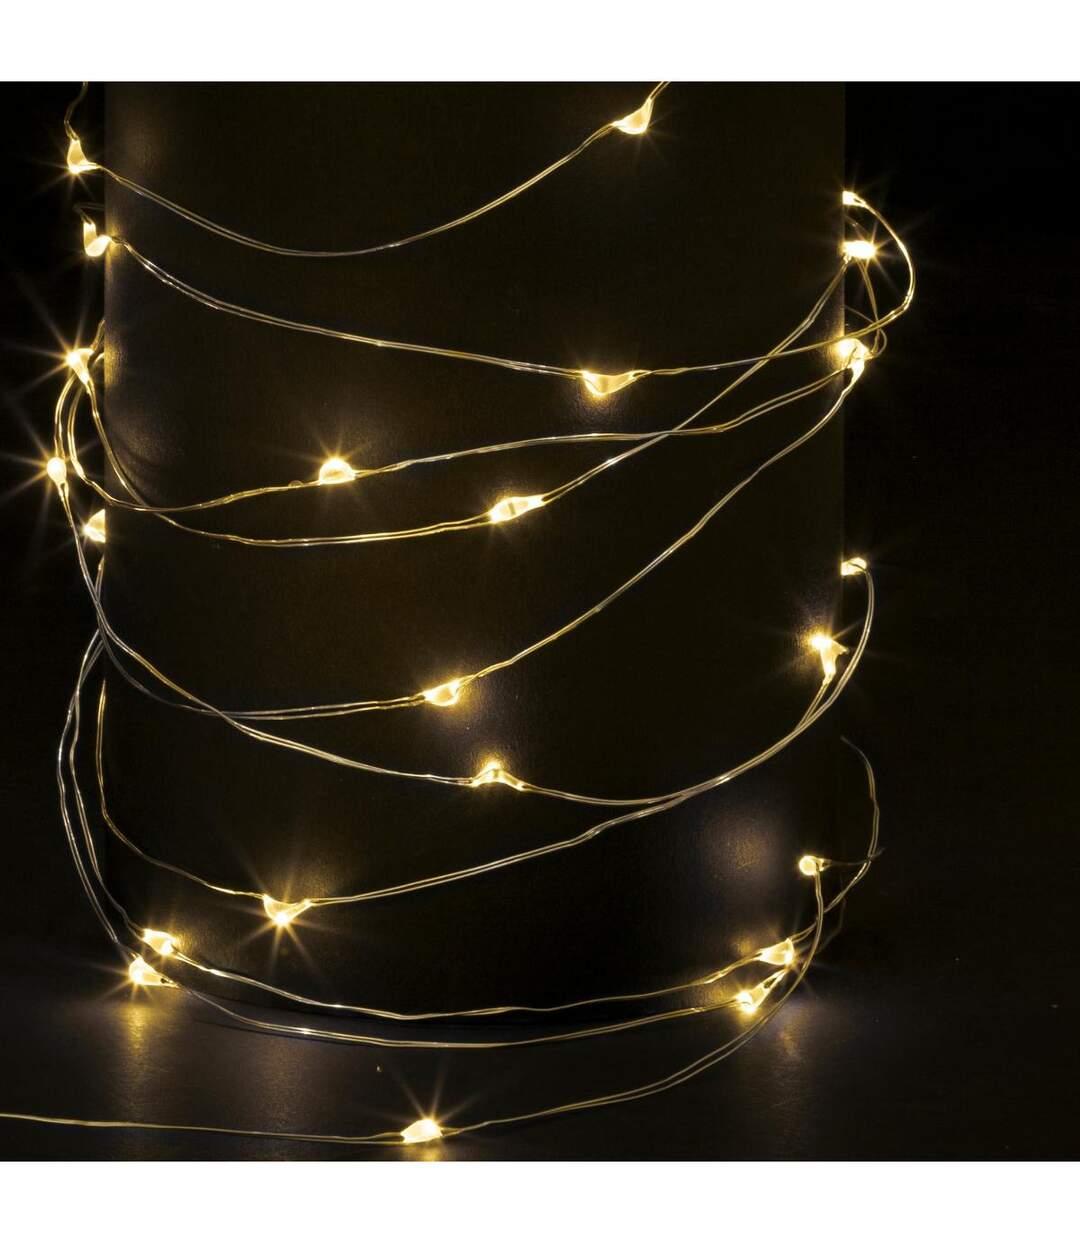 Feeric Christmas - Guirlande Lumineuse Intérieure et Extérieure 20 m 200 MicroLED Blanc chaud lumière fixe